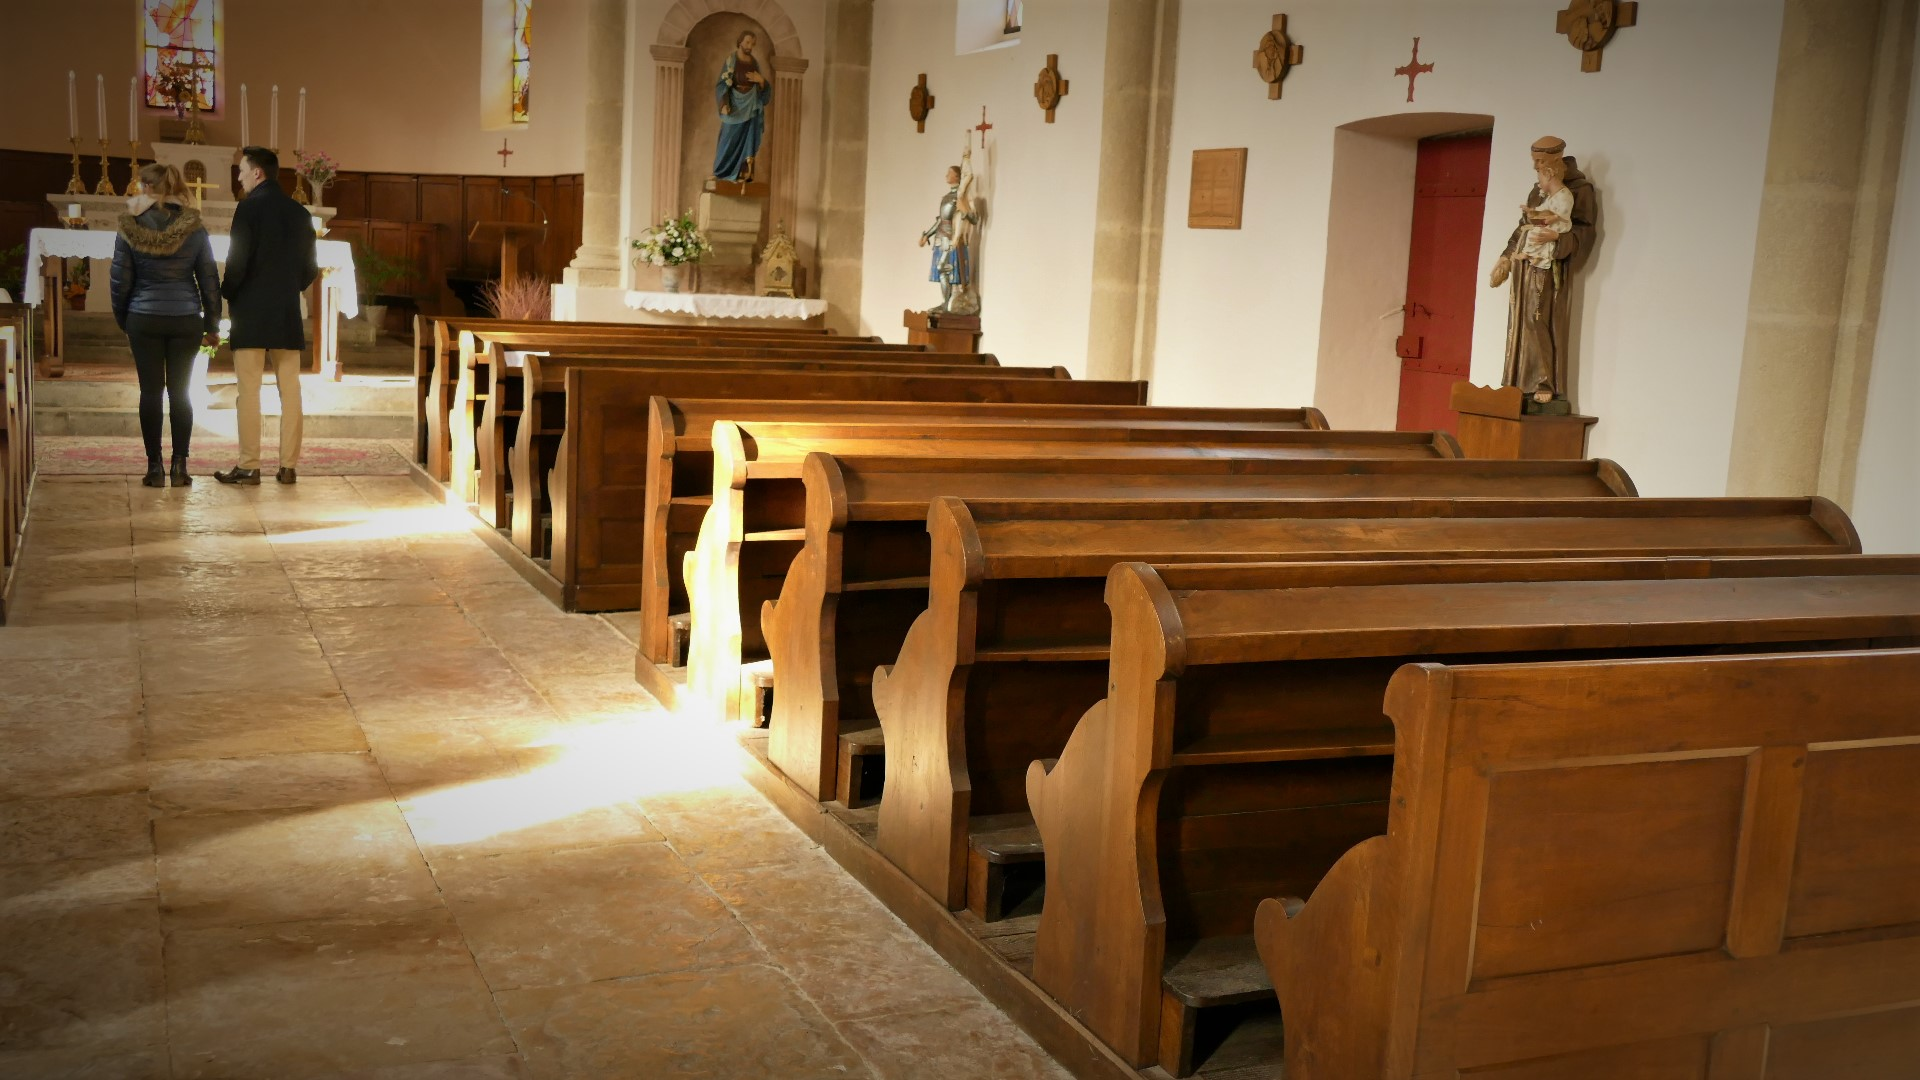 B3 église intérieur.jpg